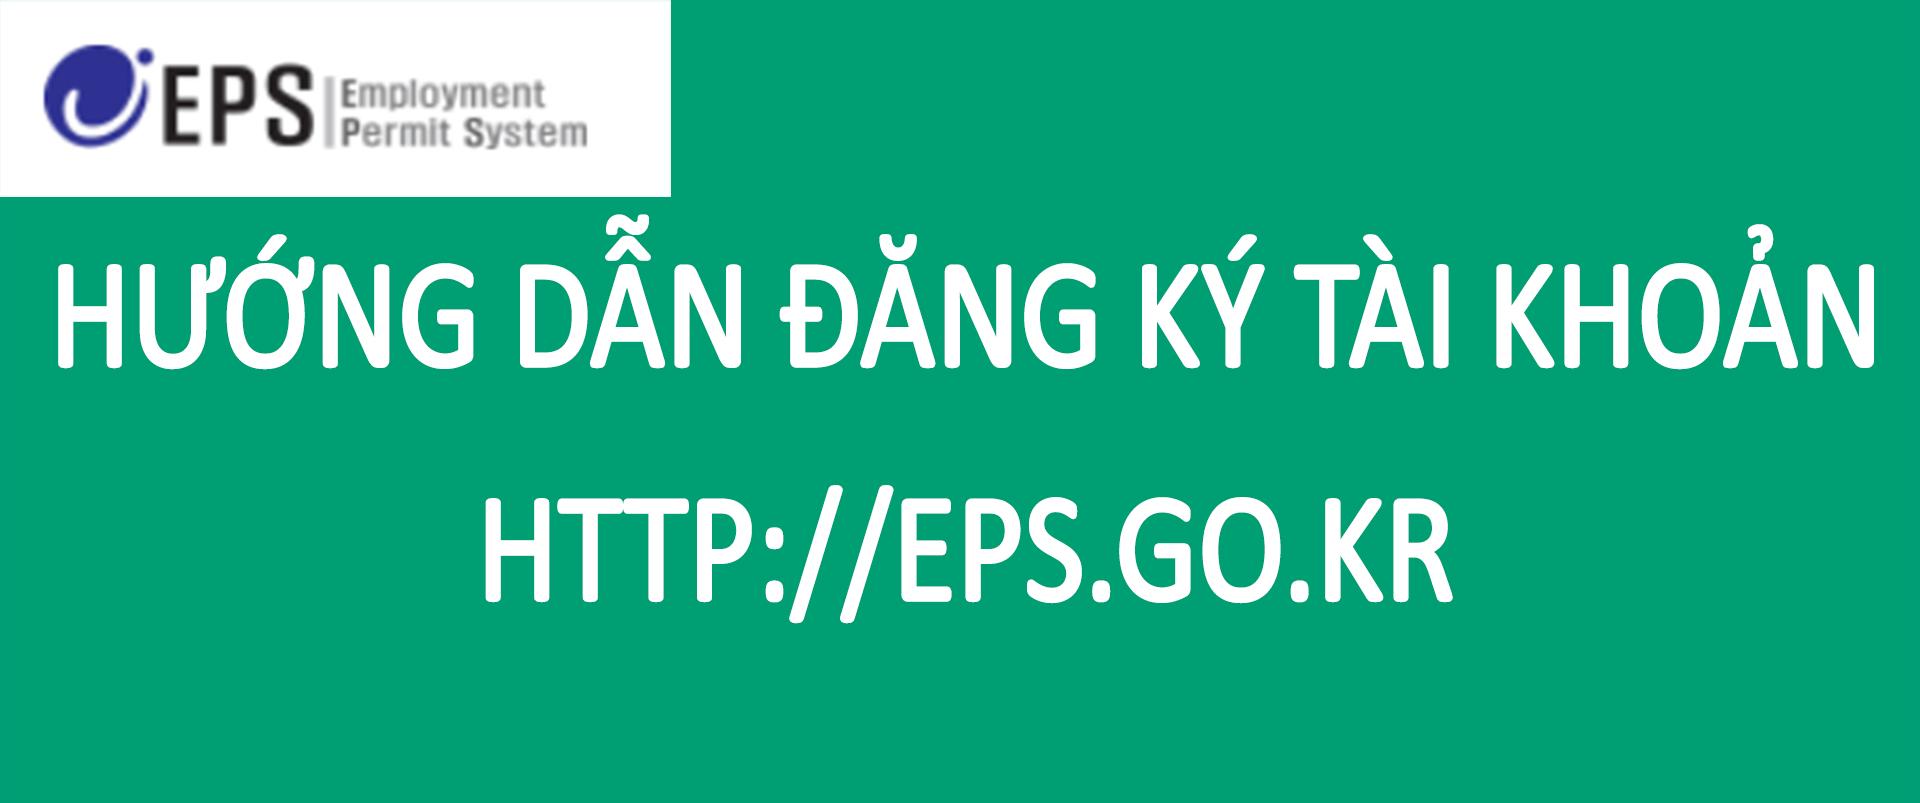 tao-tai-khoan-eps-go-kr